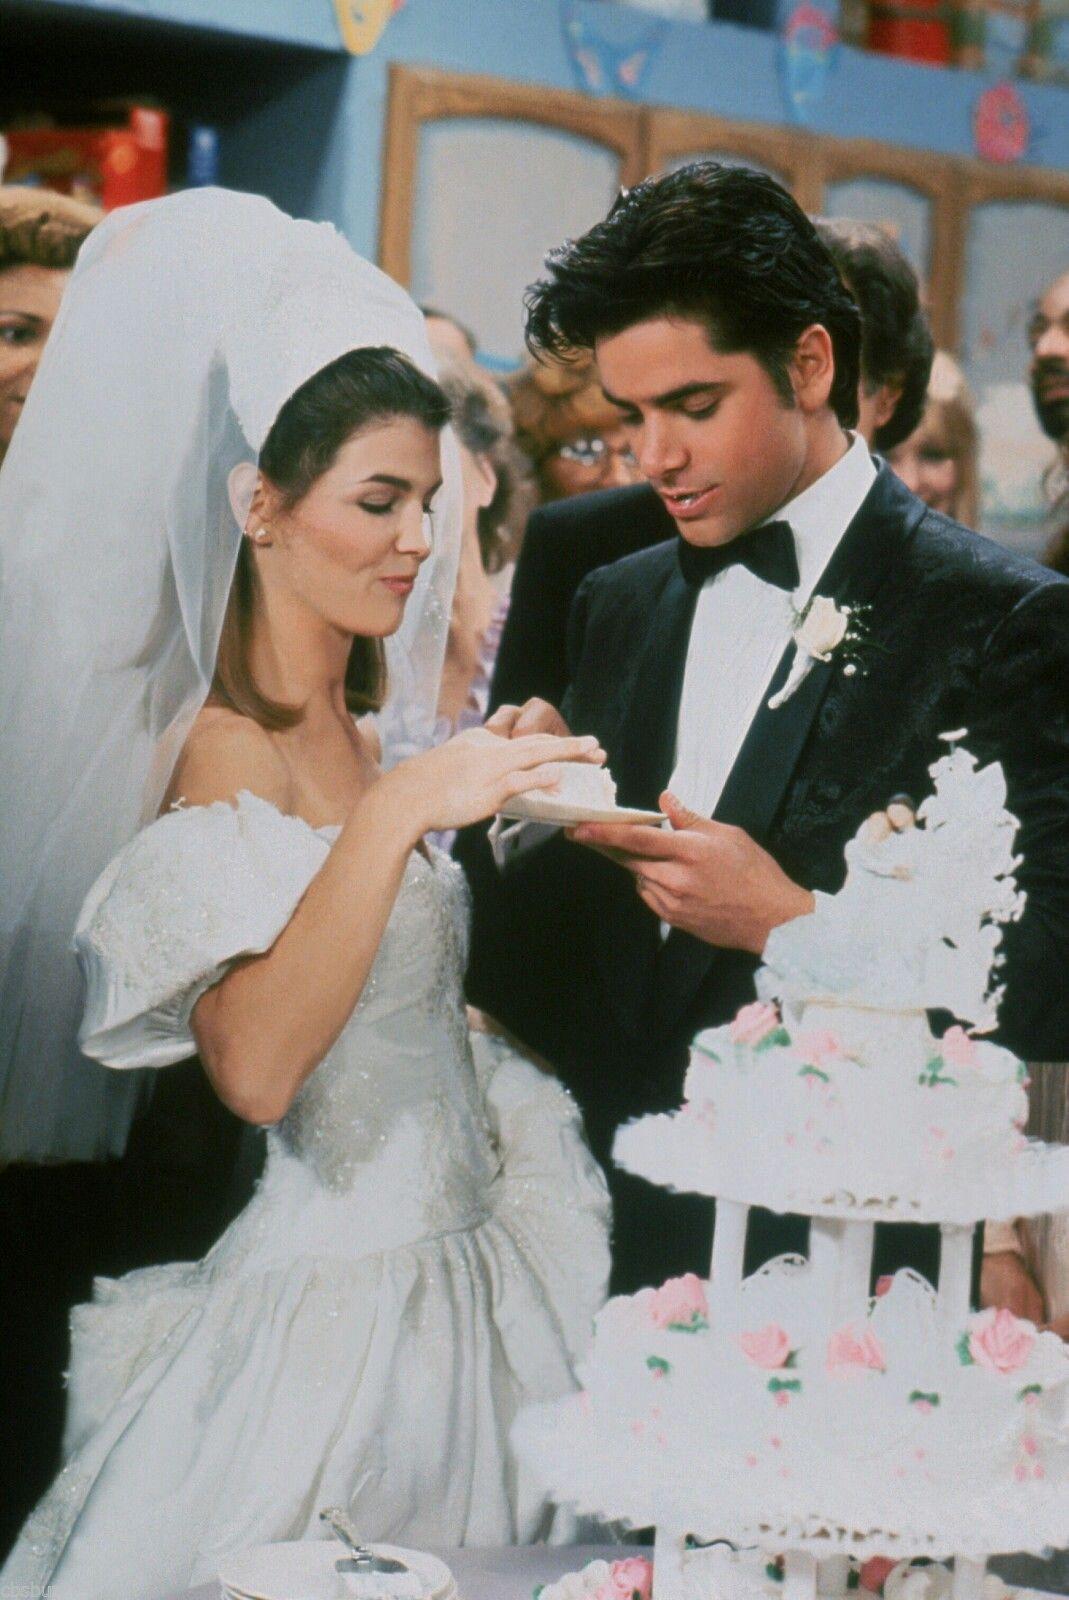 Famous wedding dresses  Becky and Jesseus Wedding  Fuller House  Pinterest  Full house